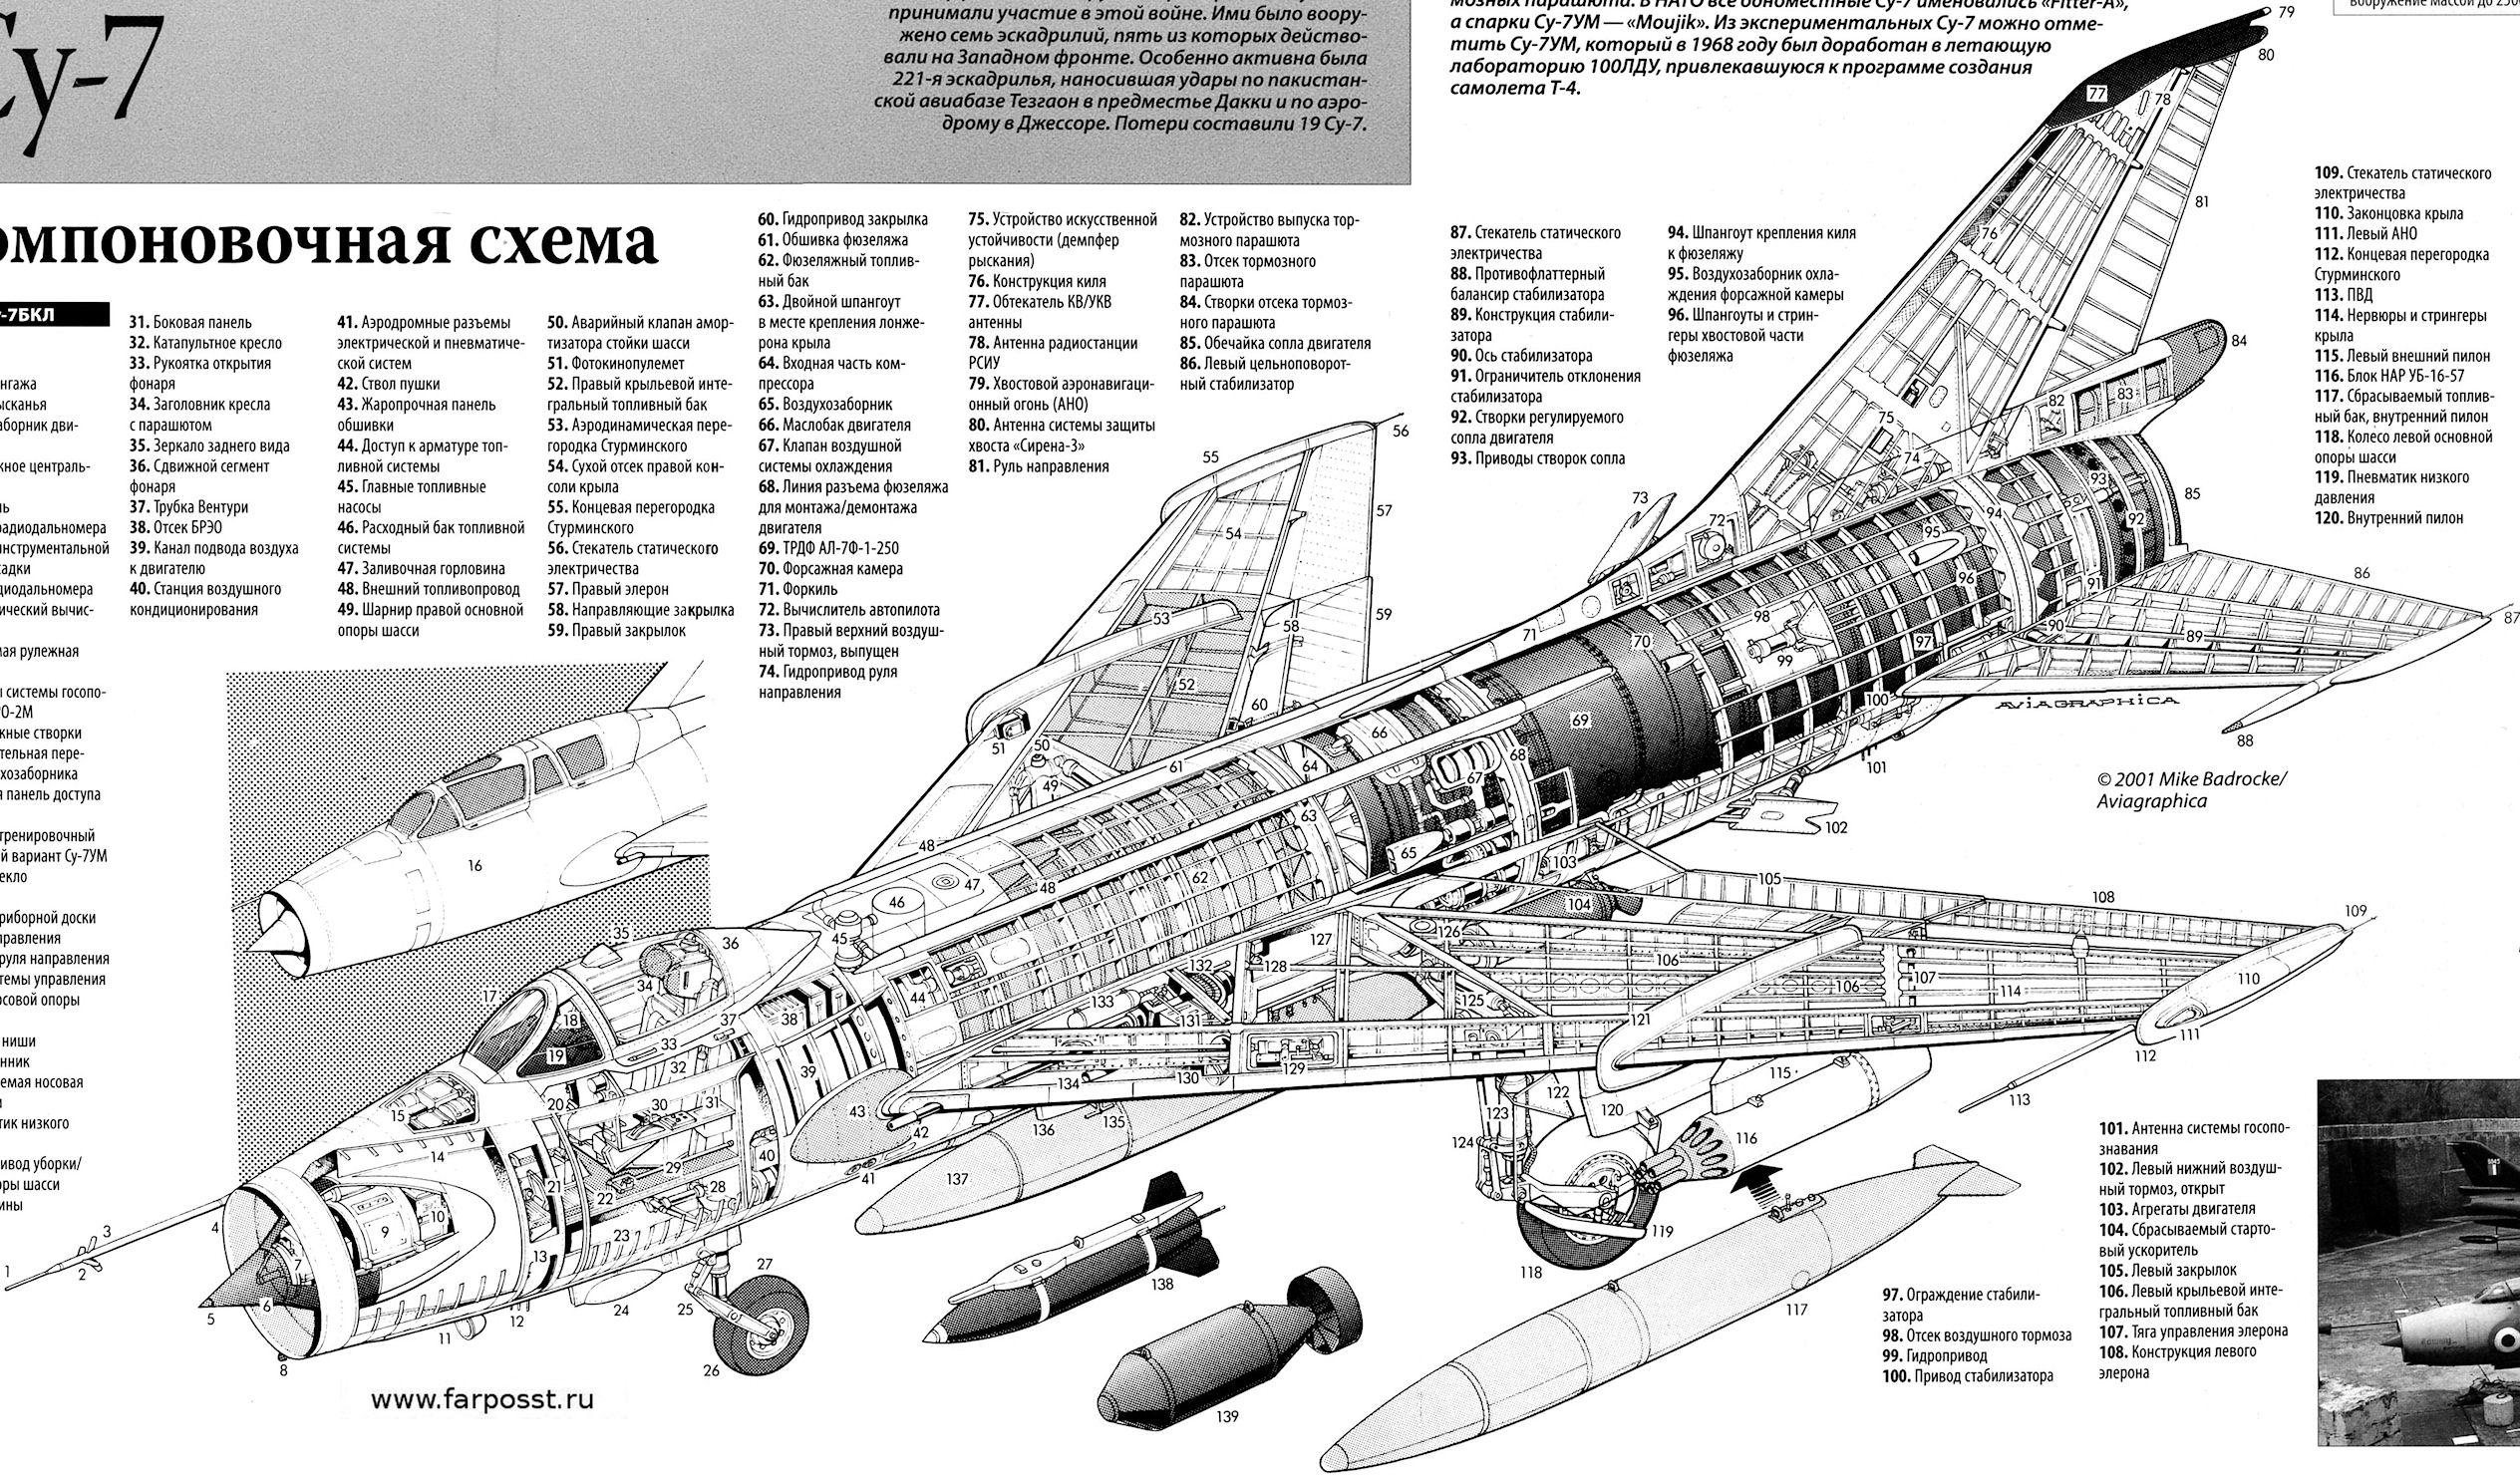 https://aviadejavu.ru/Images6/MM/MM-127/0411-01-2-8.jpg